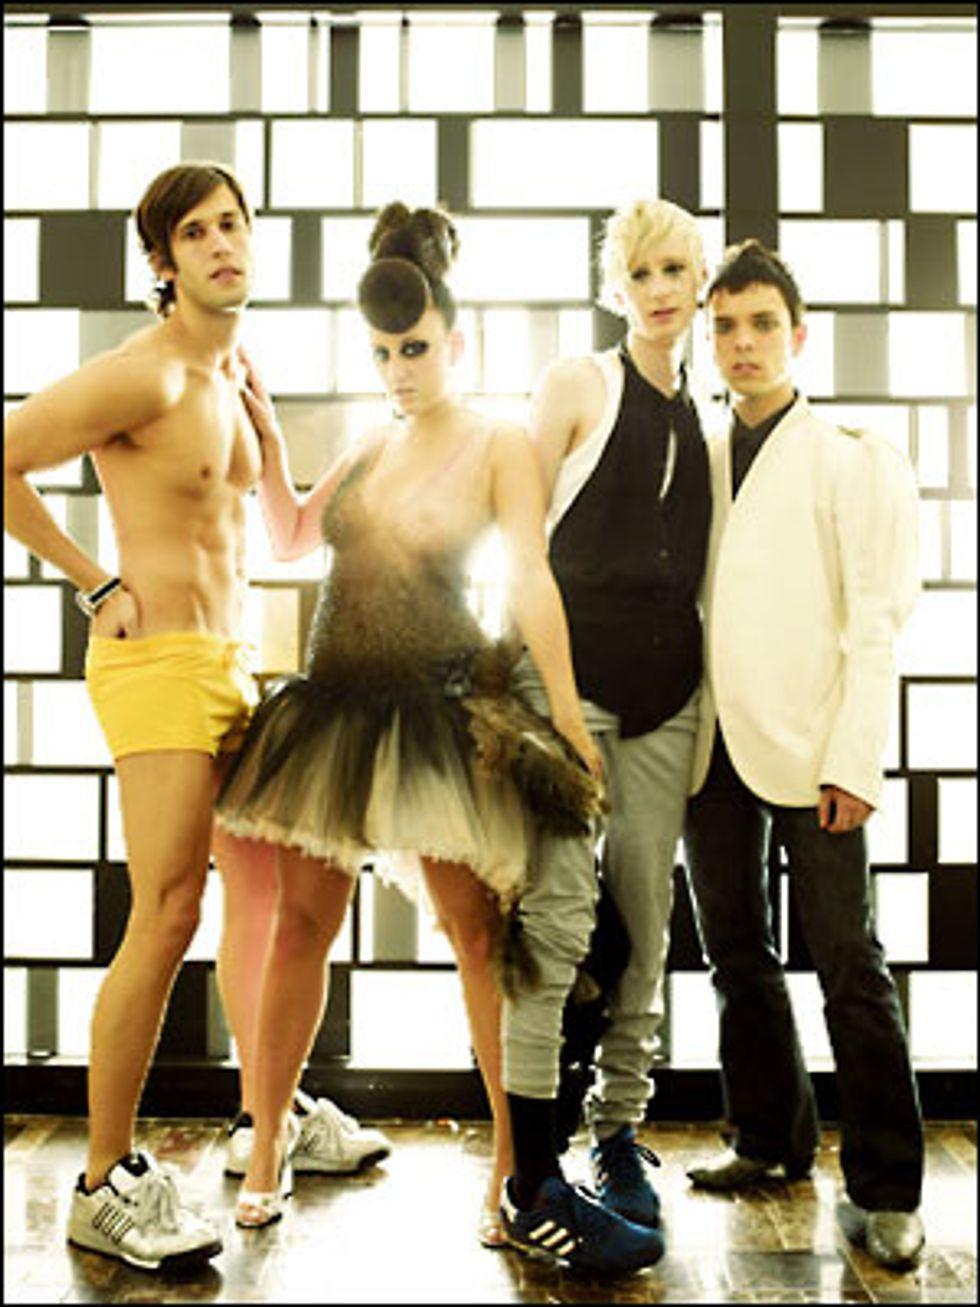 Beautiful People 2004: Club Kidz Nouveau II